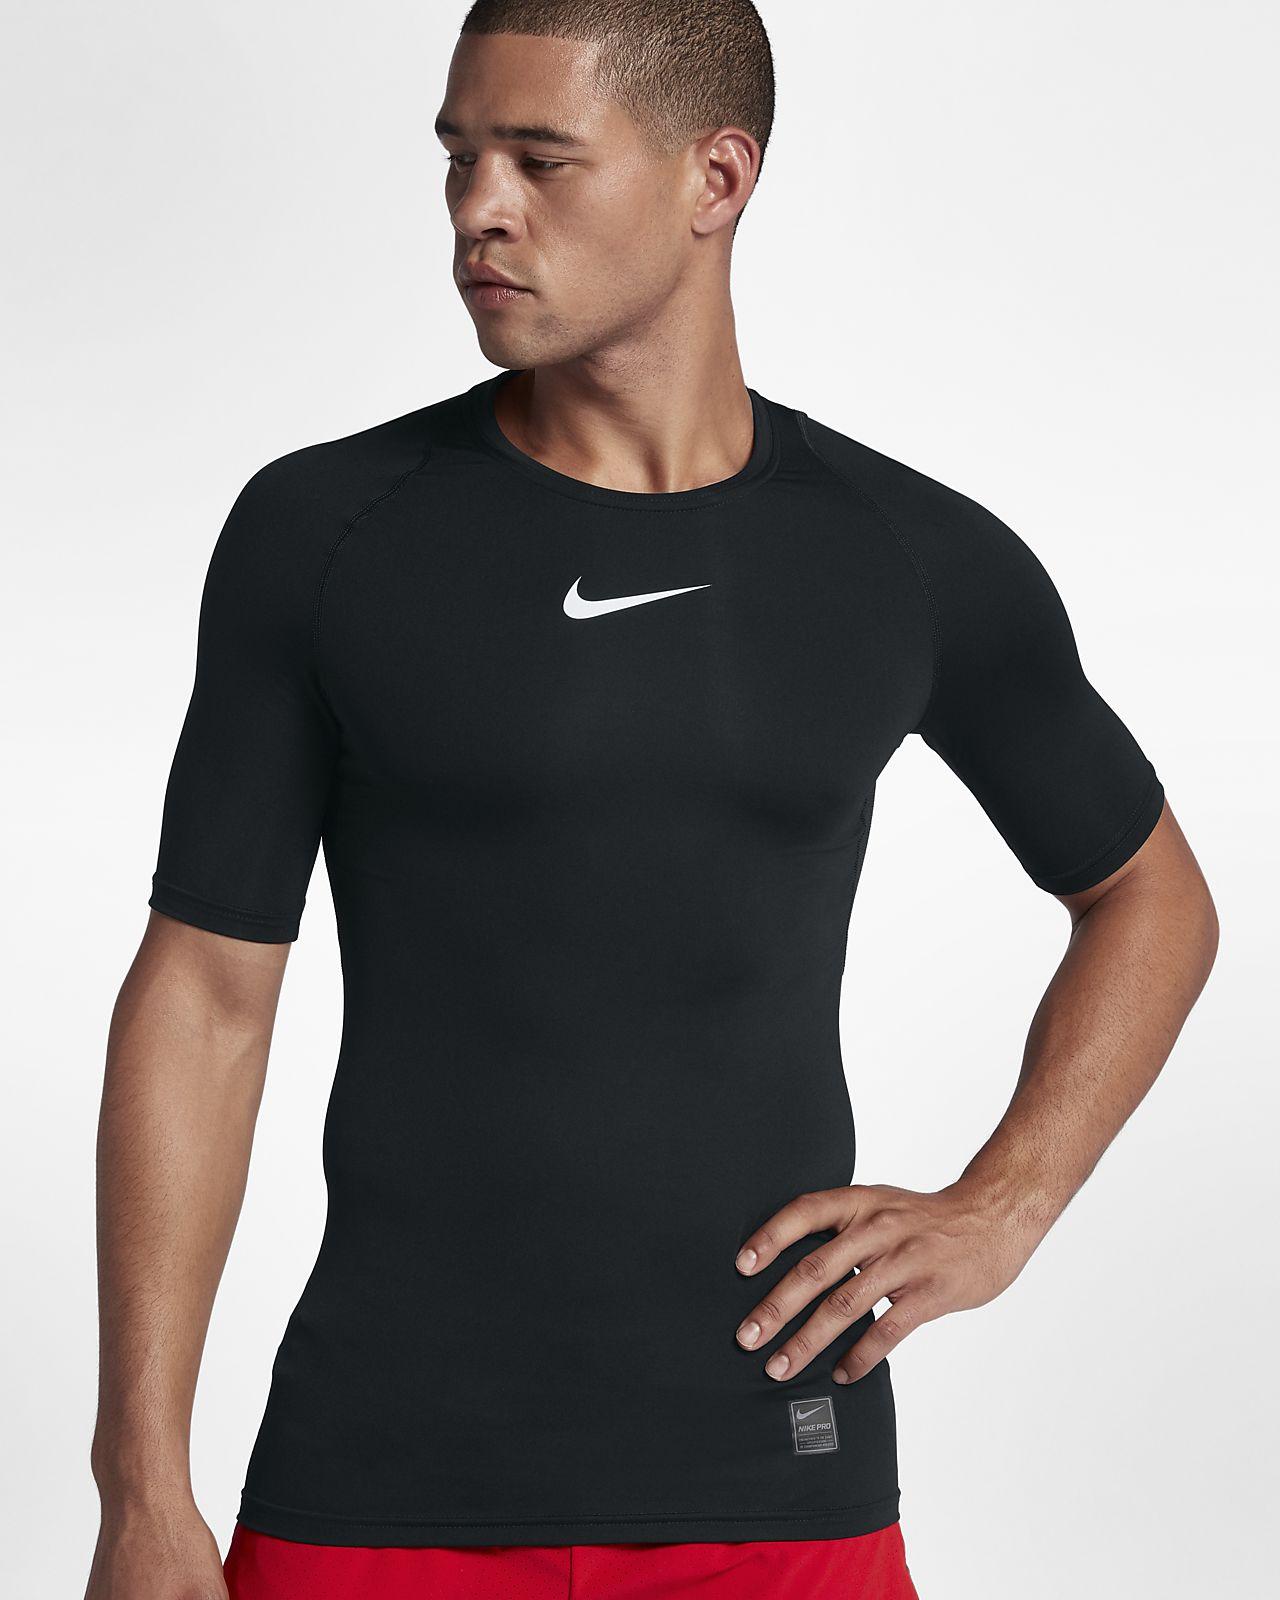 Nike Pro 男子短袖训练紧身衣